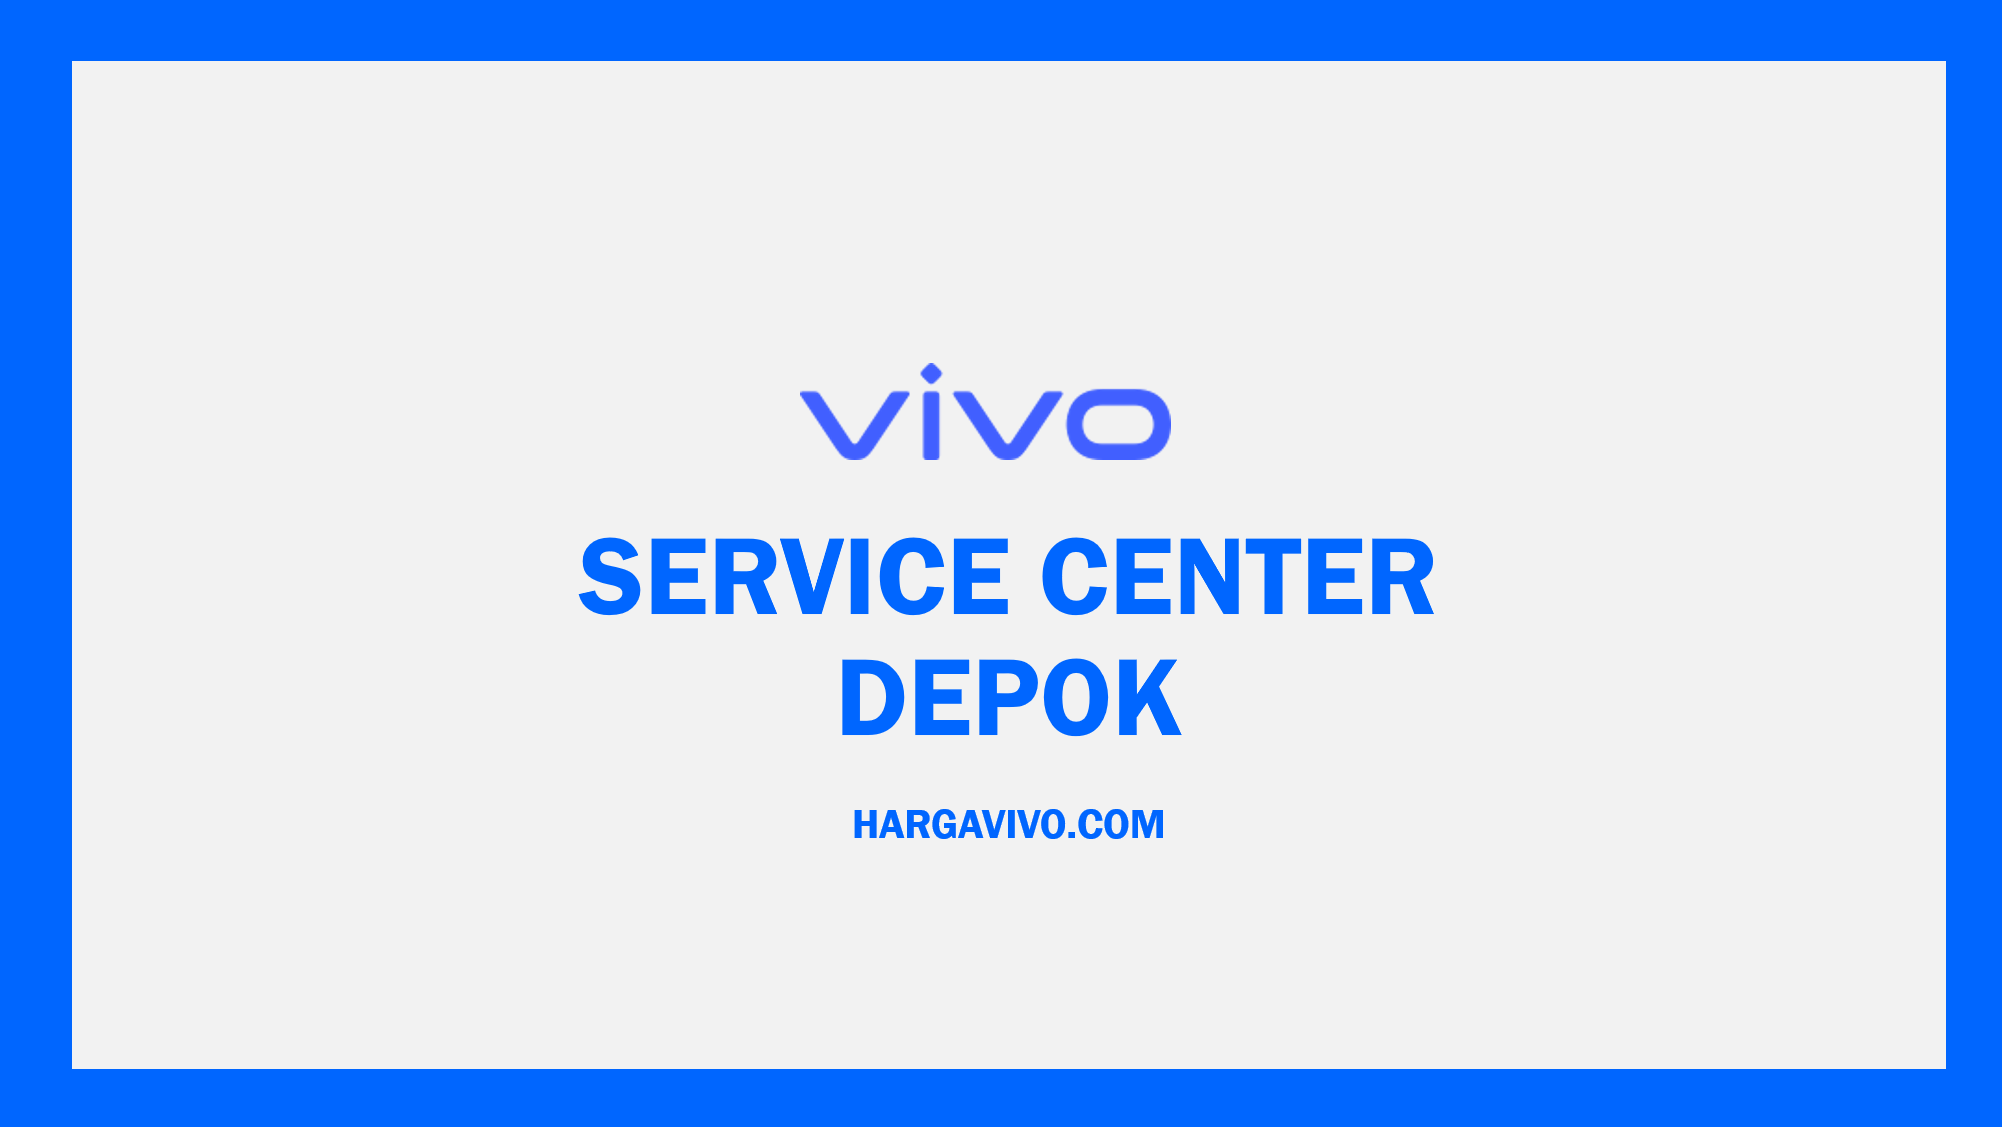 Service Center Vivo Depok